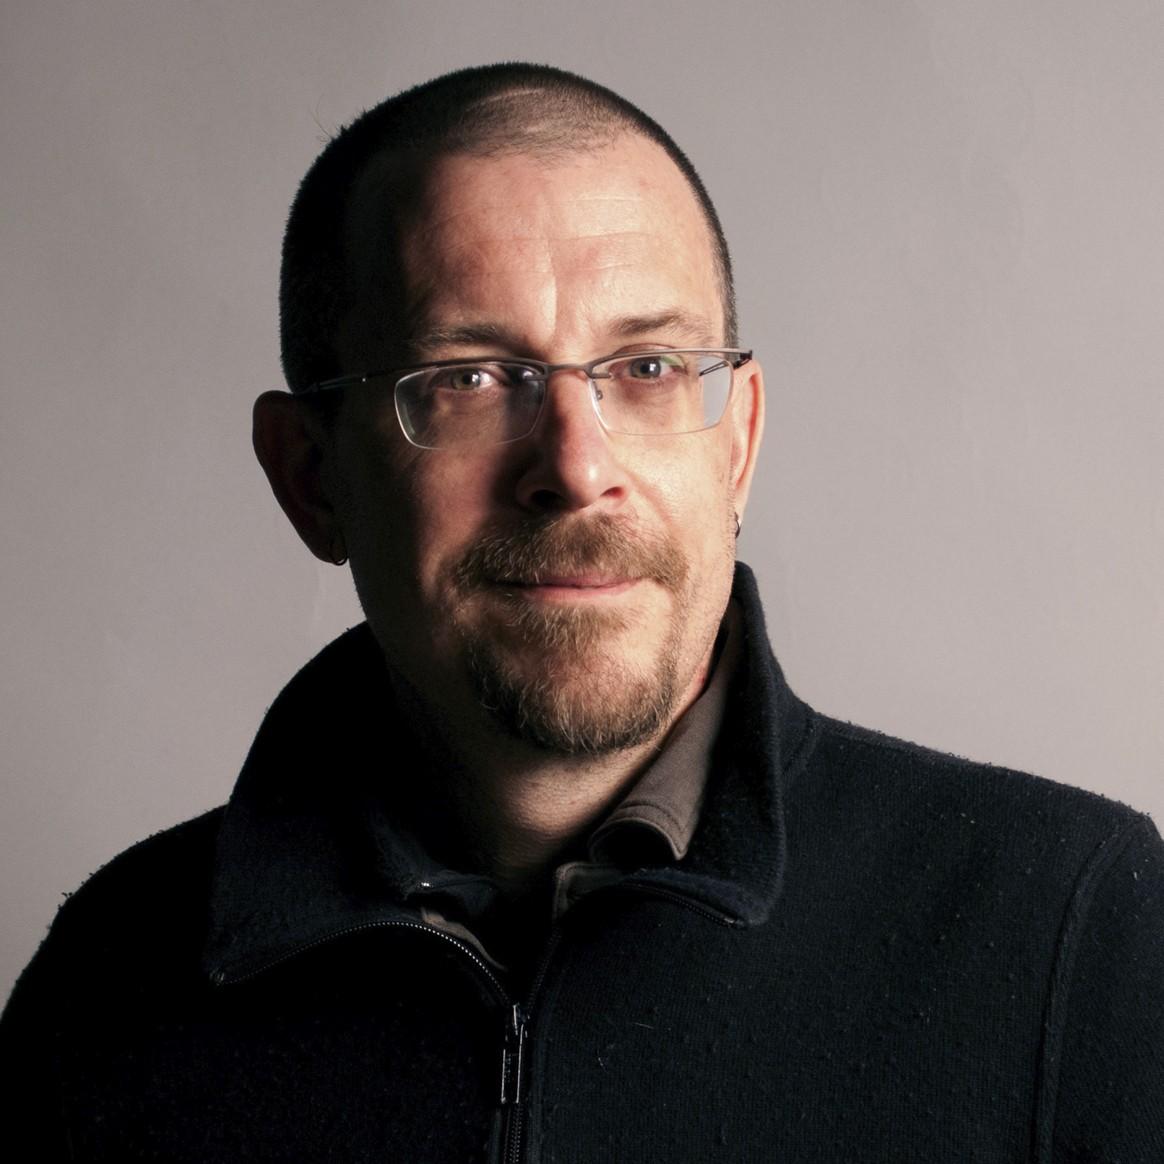 Portrait of Penn State Department of Architecture Associate Professor Peter Aeschbacher